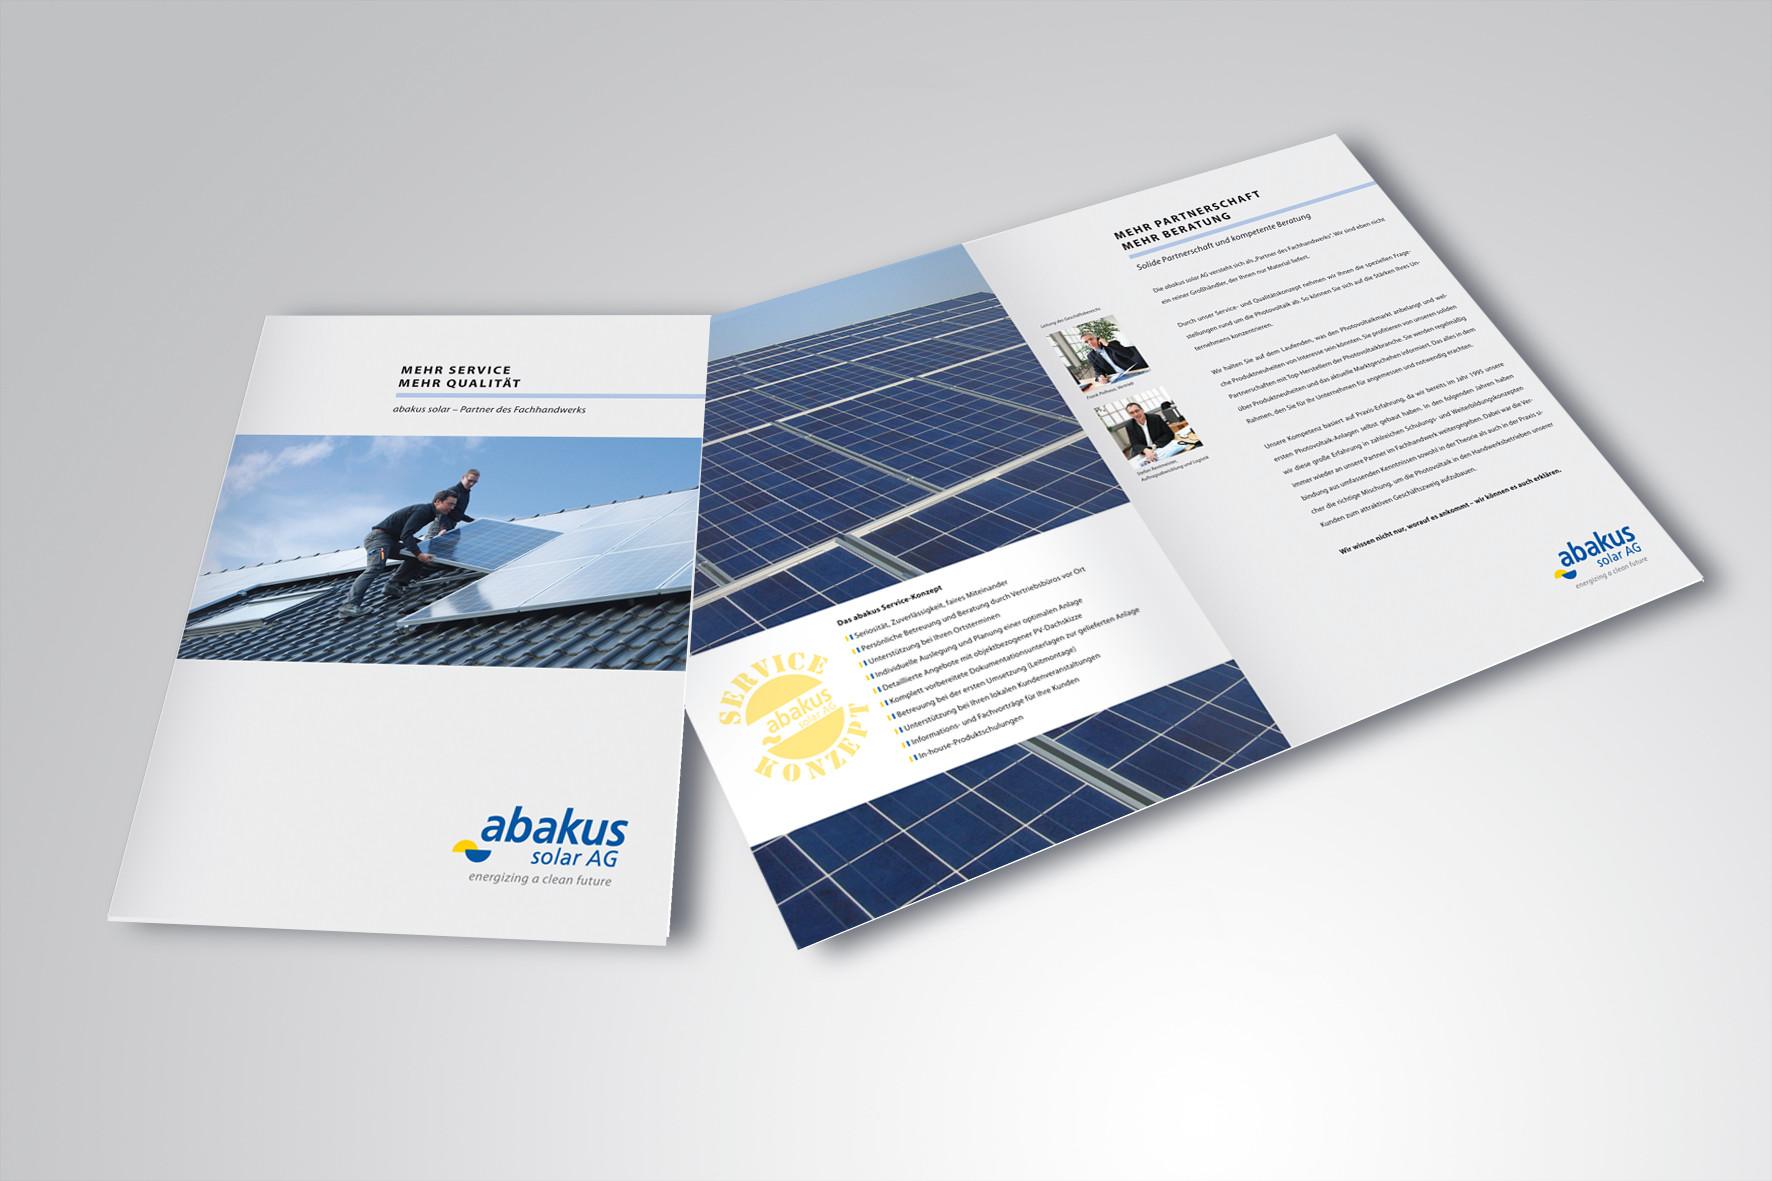 Kunde: abakus solar AG · Produkt: Händler Broschüre